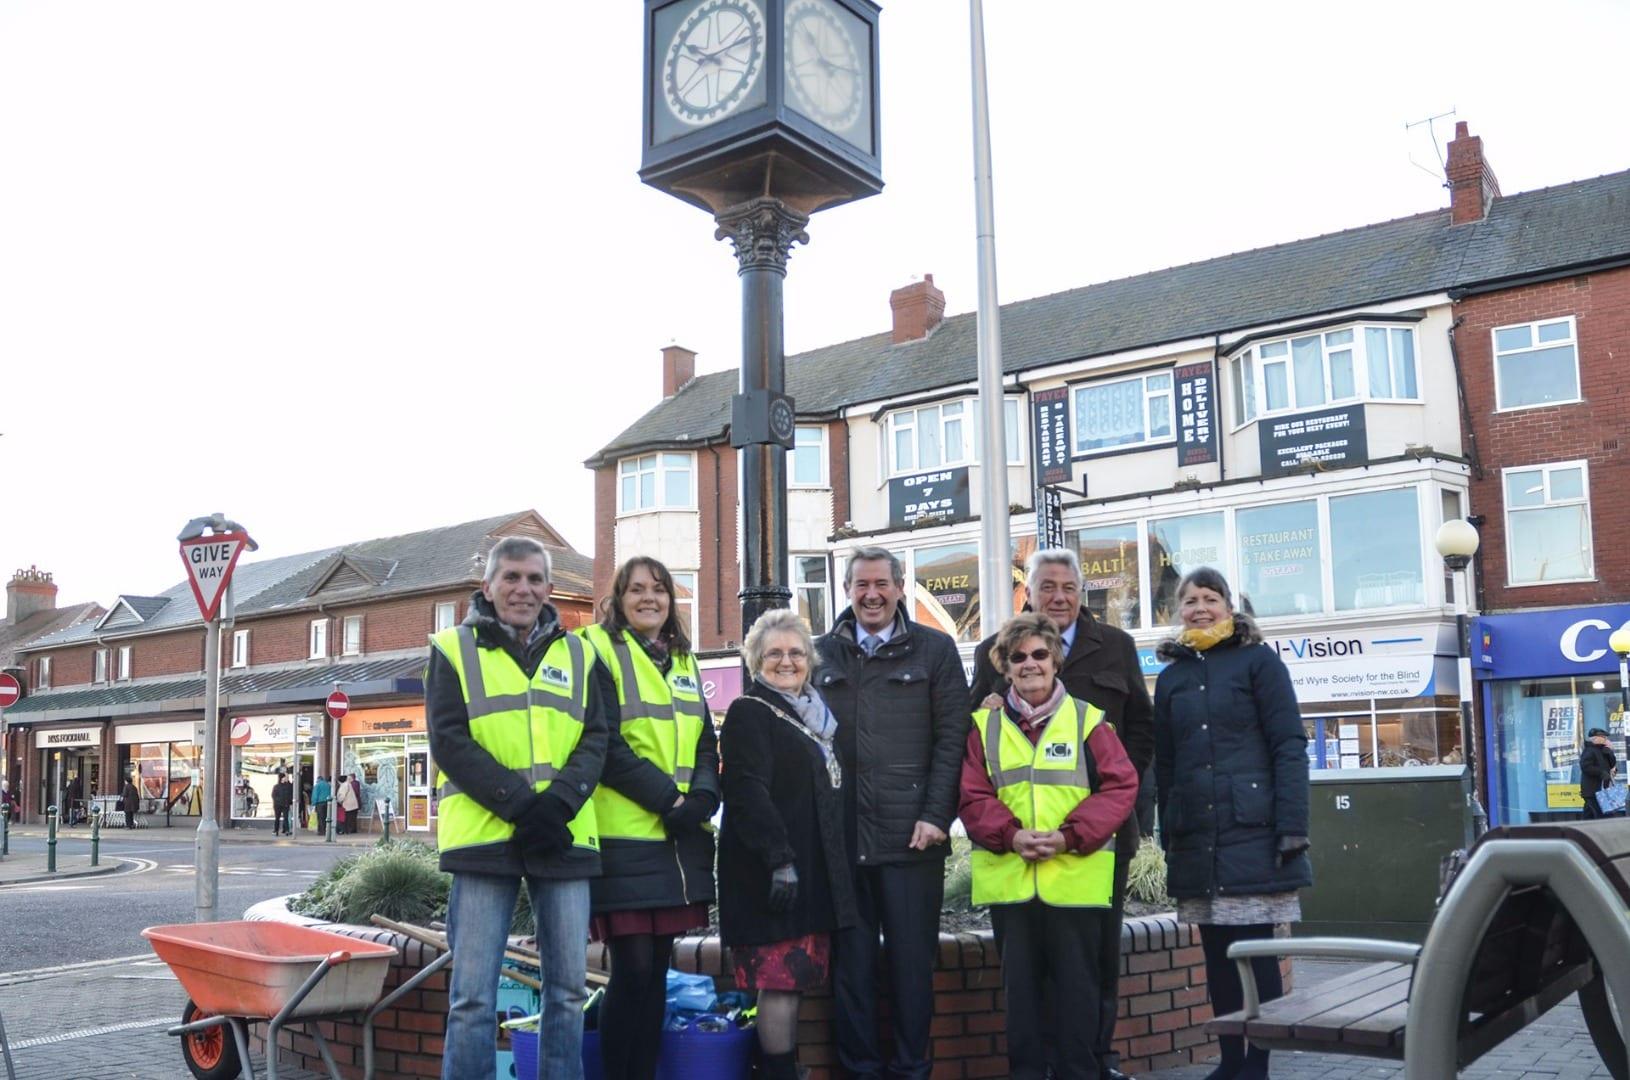 High Sheriff of Lancashire visits Cleveleys Coastal Community Group. Cleveleys Coastal Community Team updates